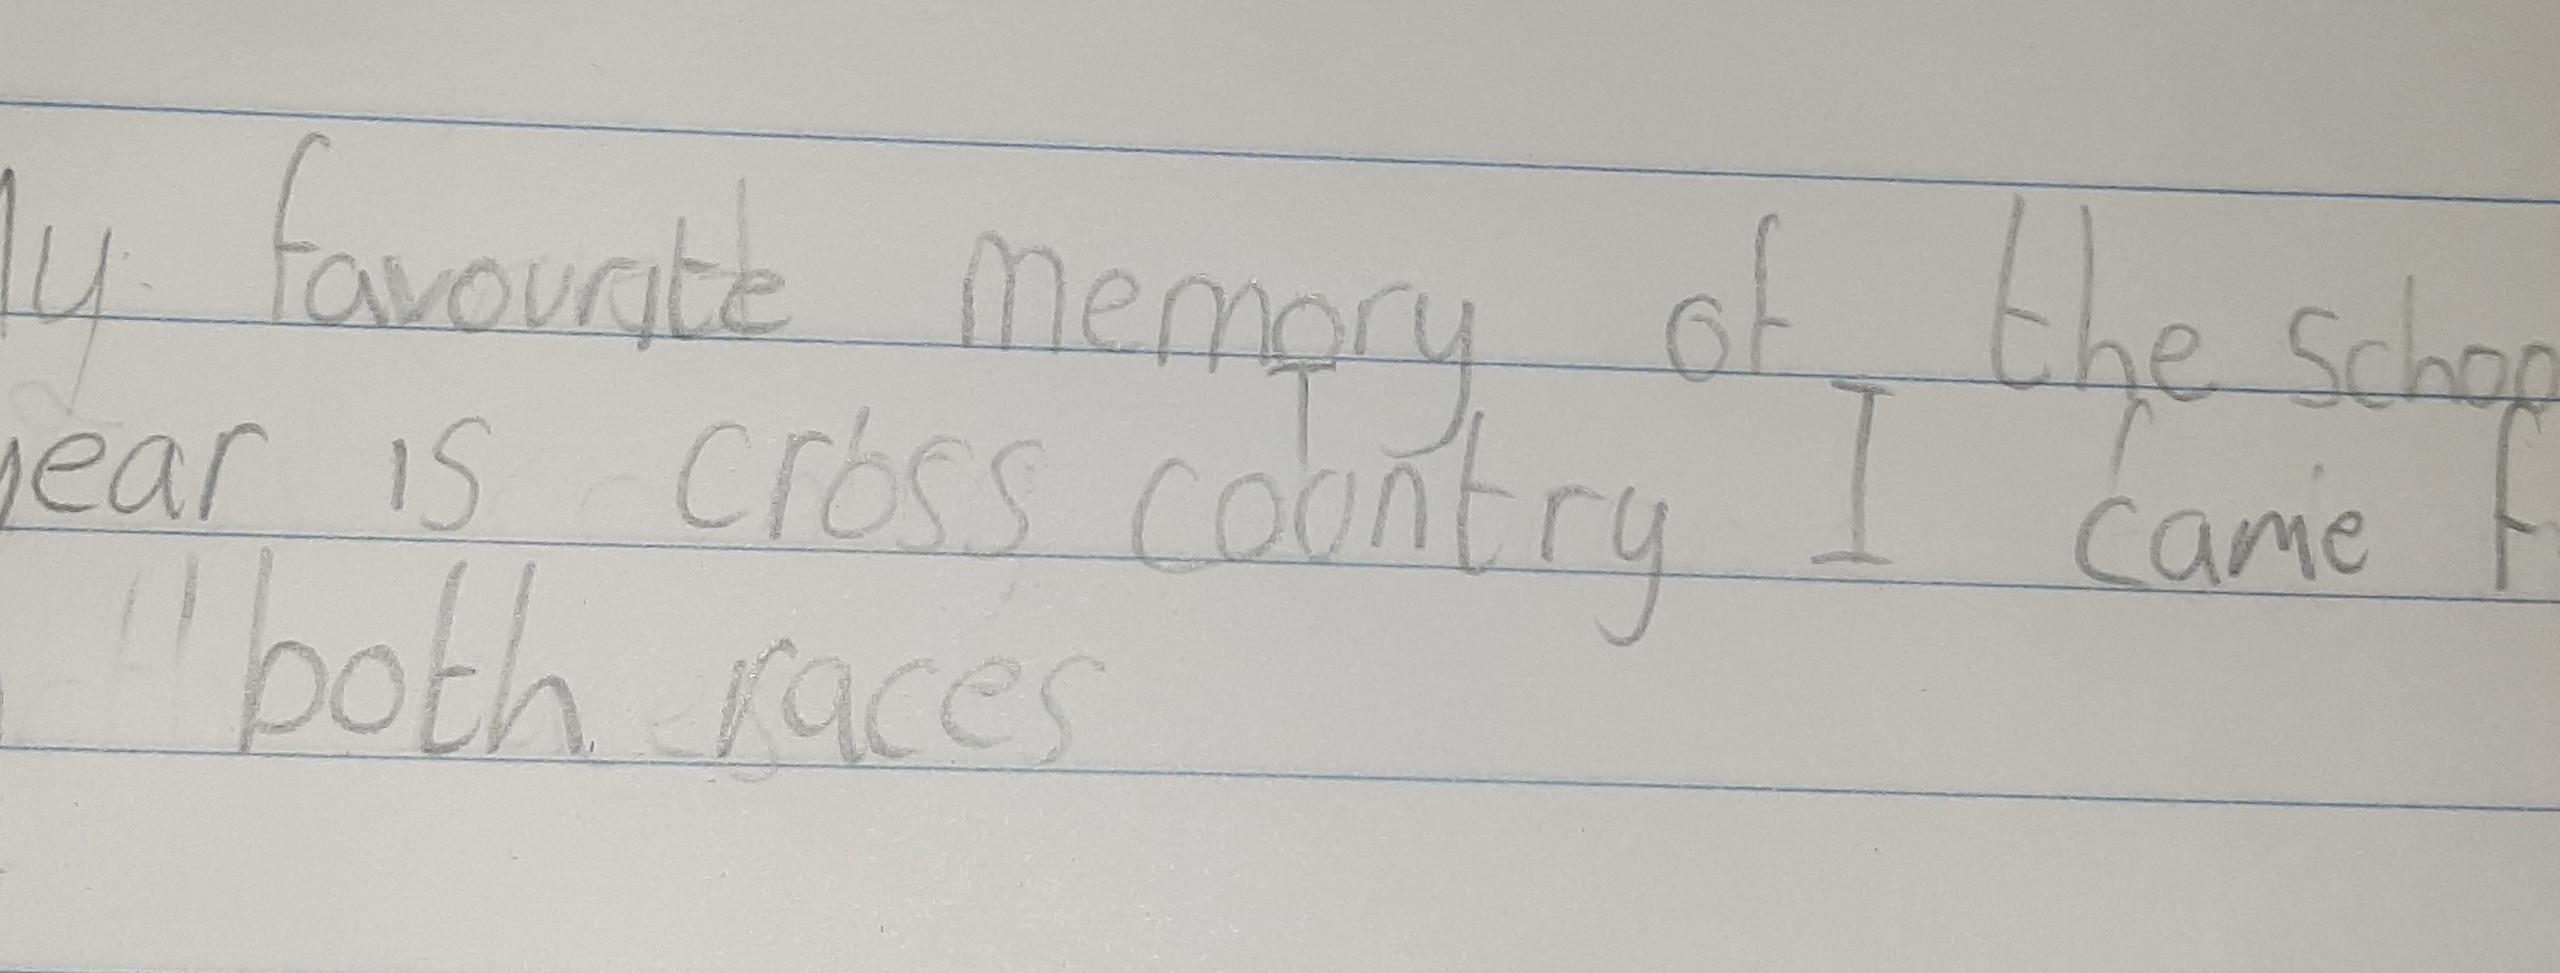 Ms. Coffey 3rd 2